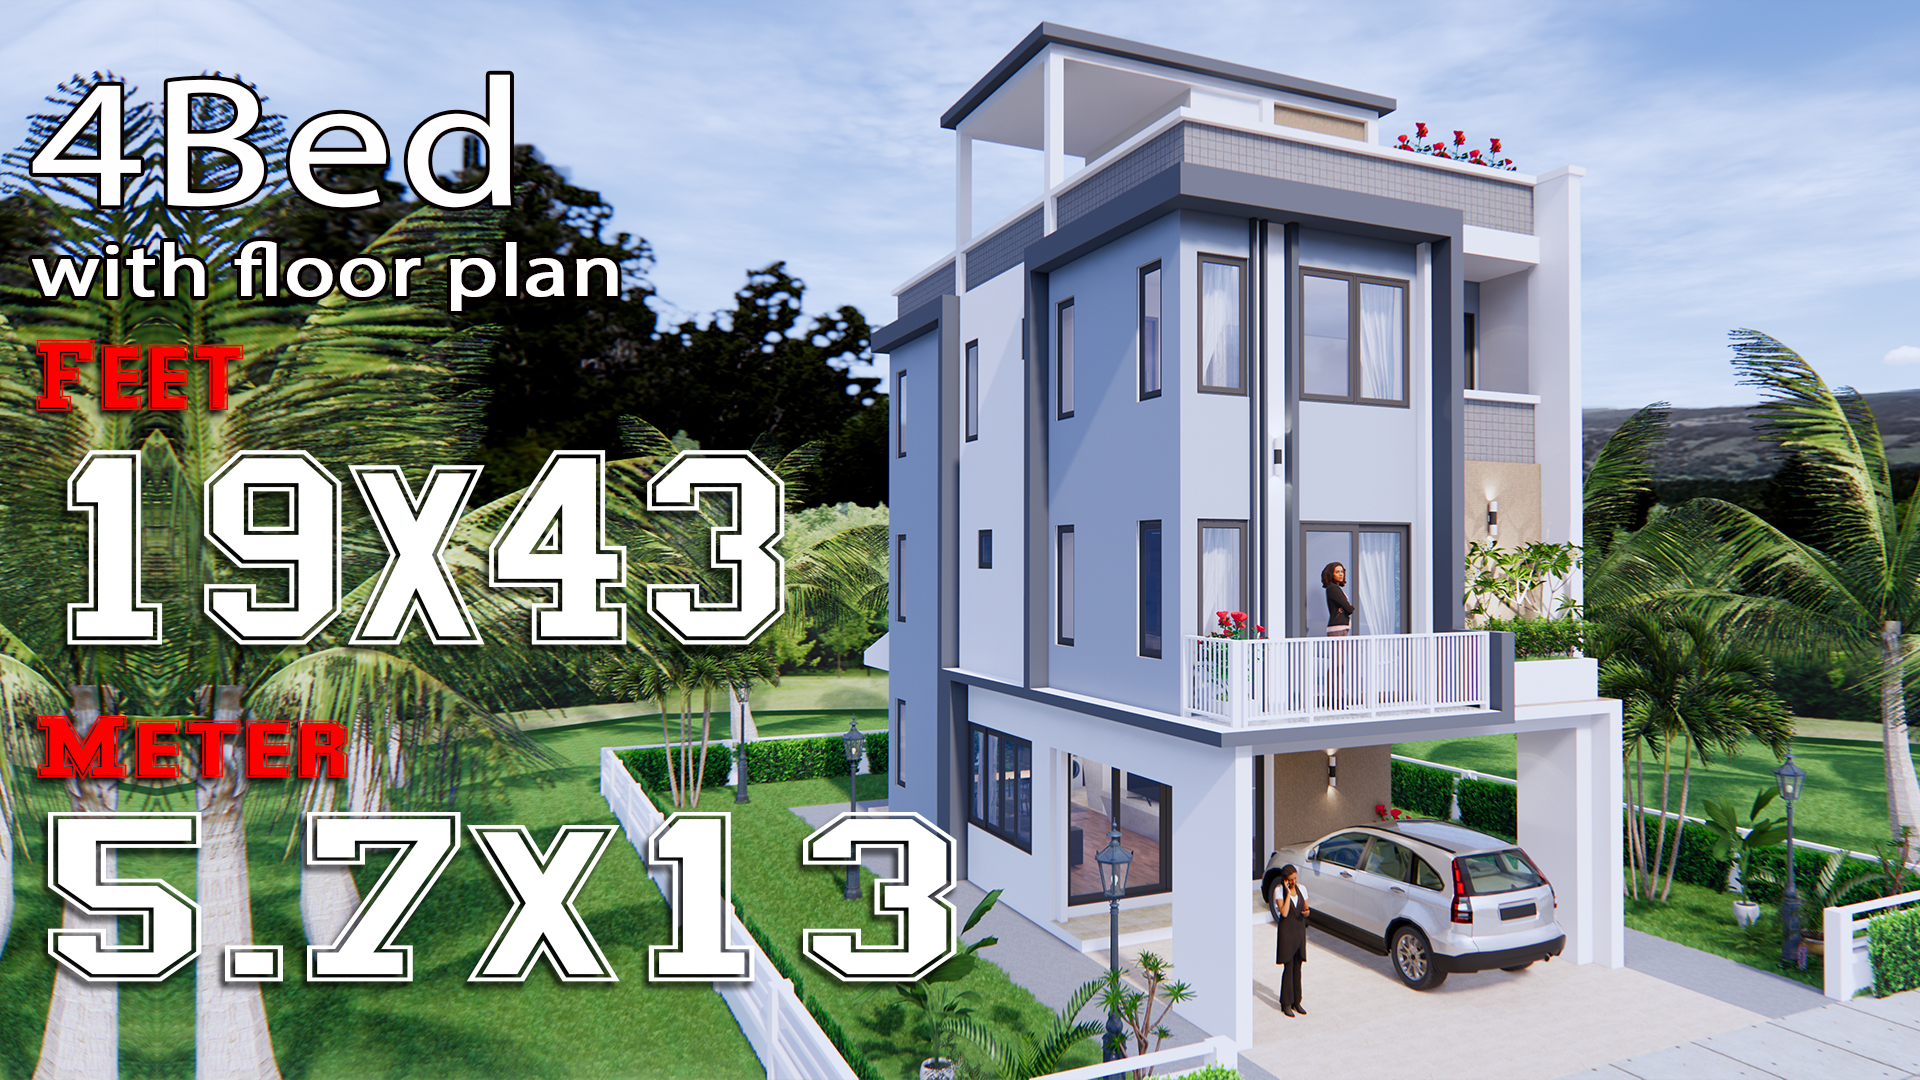 Interior House Design 5 7x13 Meter 19x43 Feet Samhouseplans